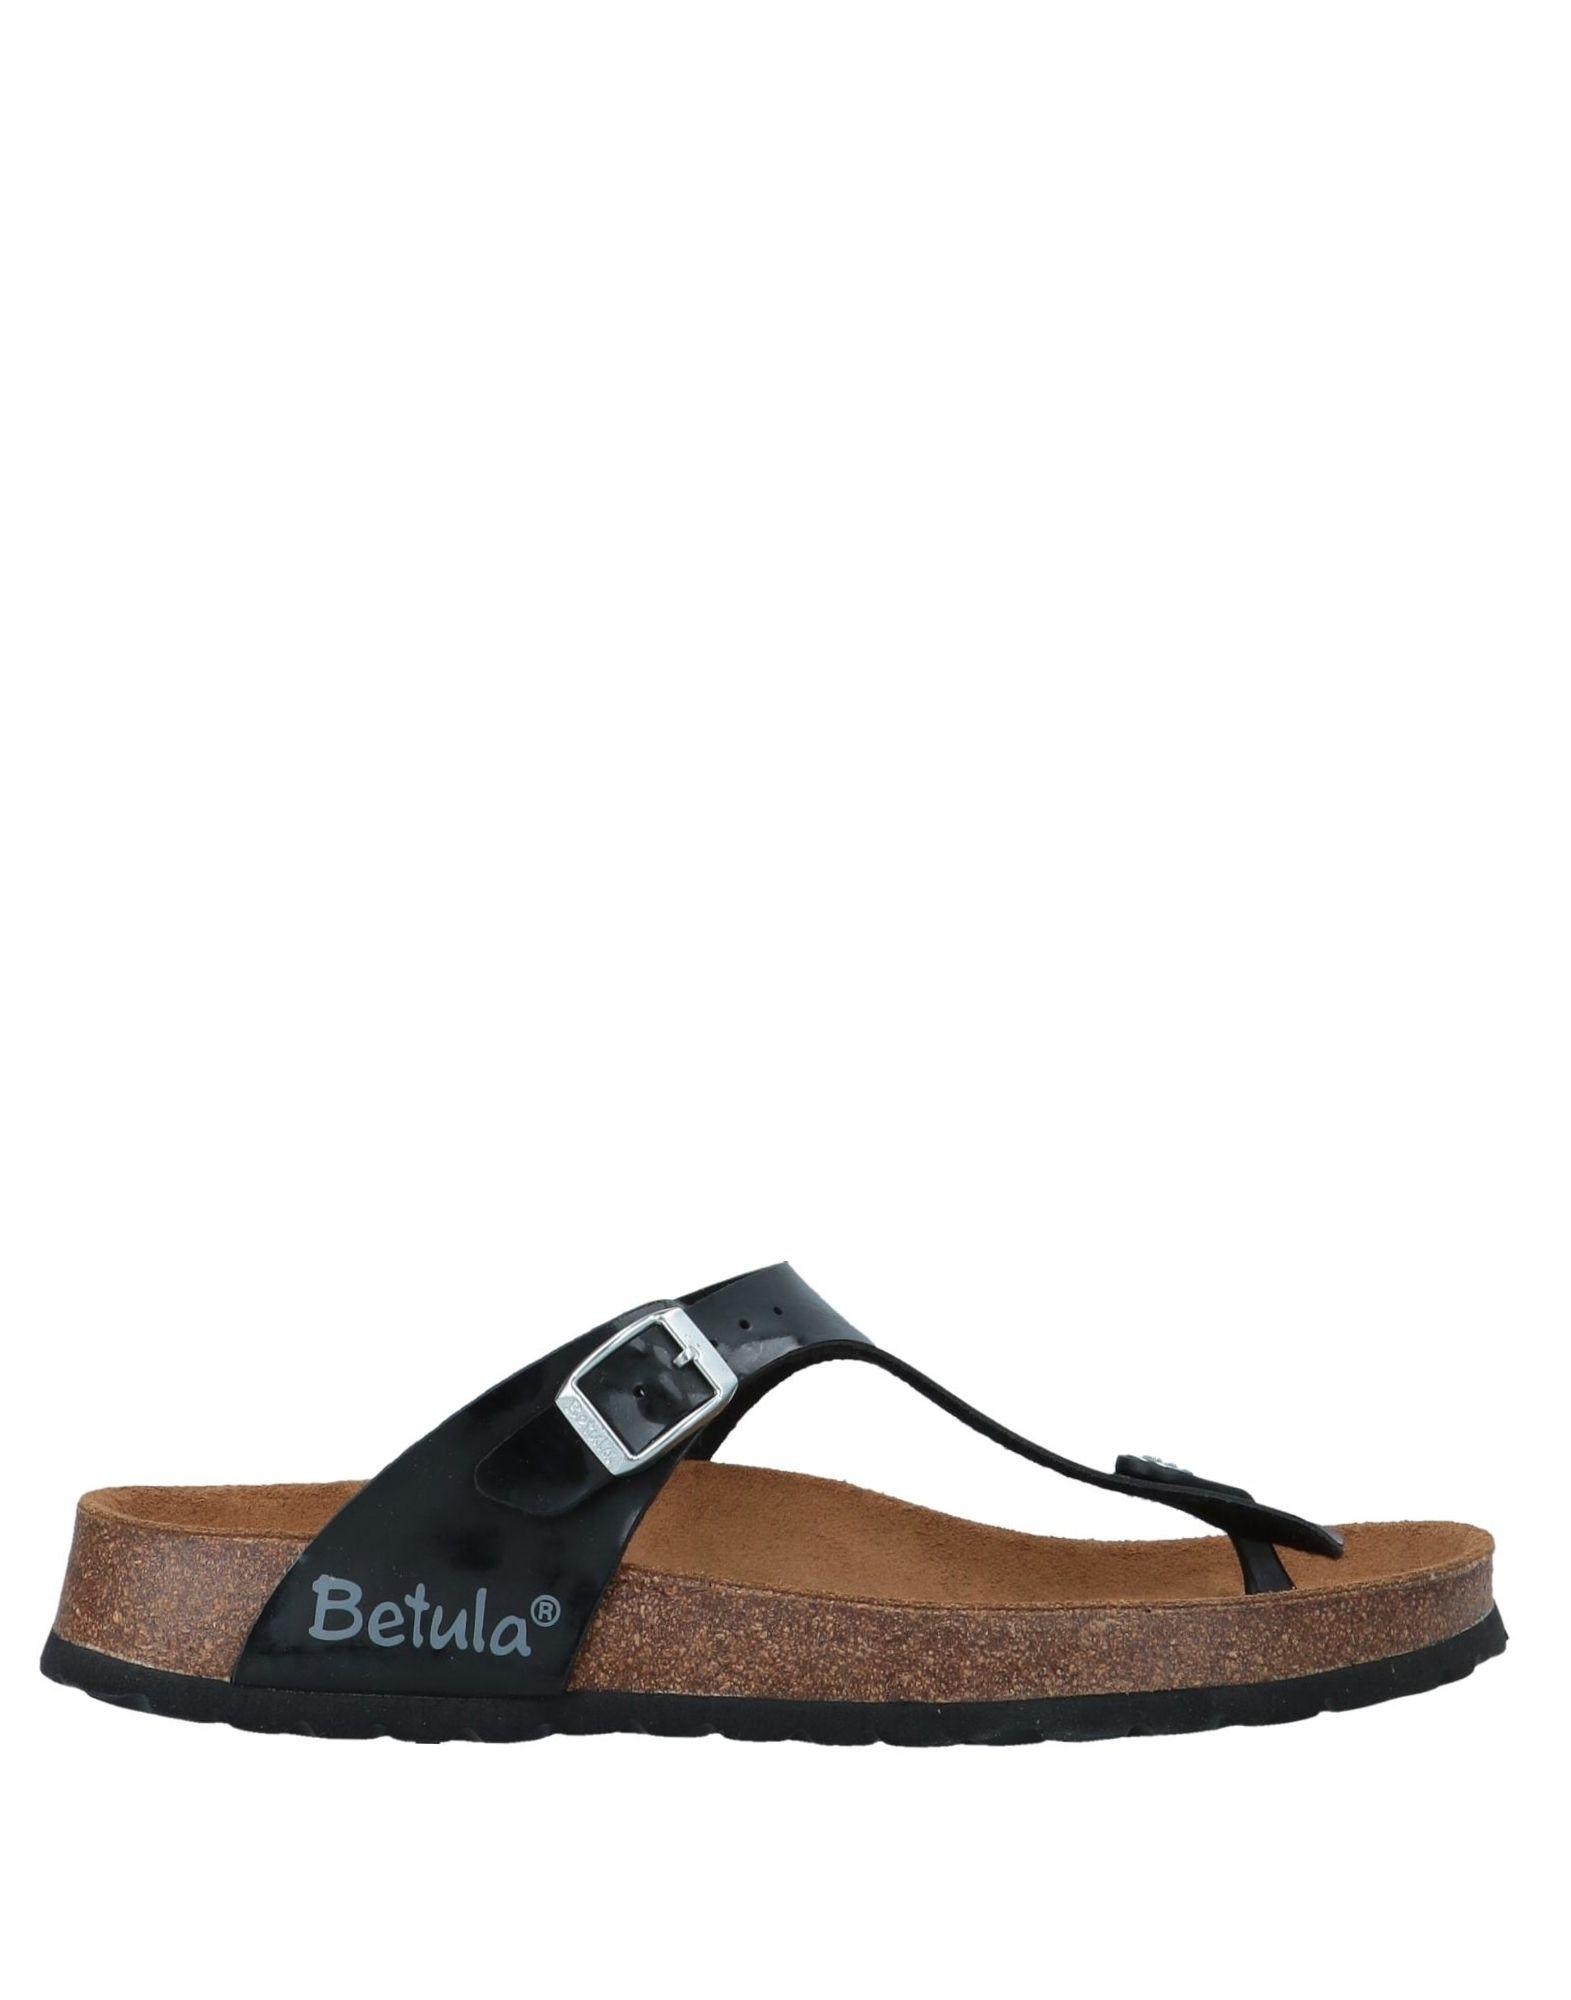 BETULA by BIRKENSTOCK Вьетнамки обувь для дома birkenstock mg betula